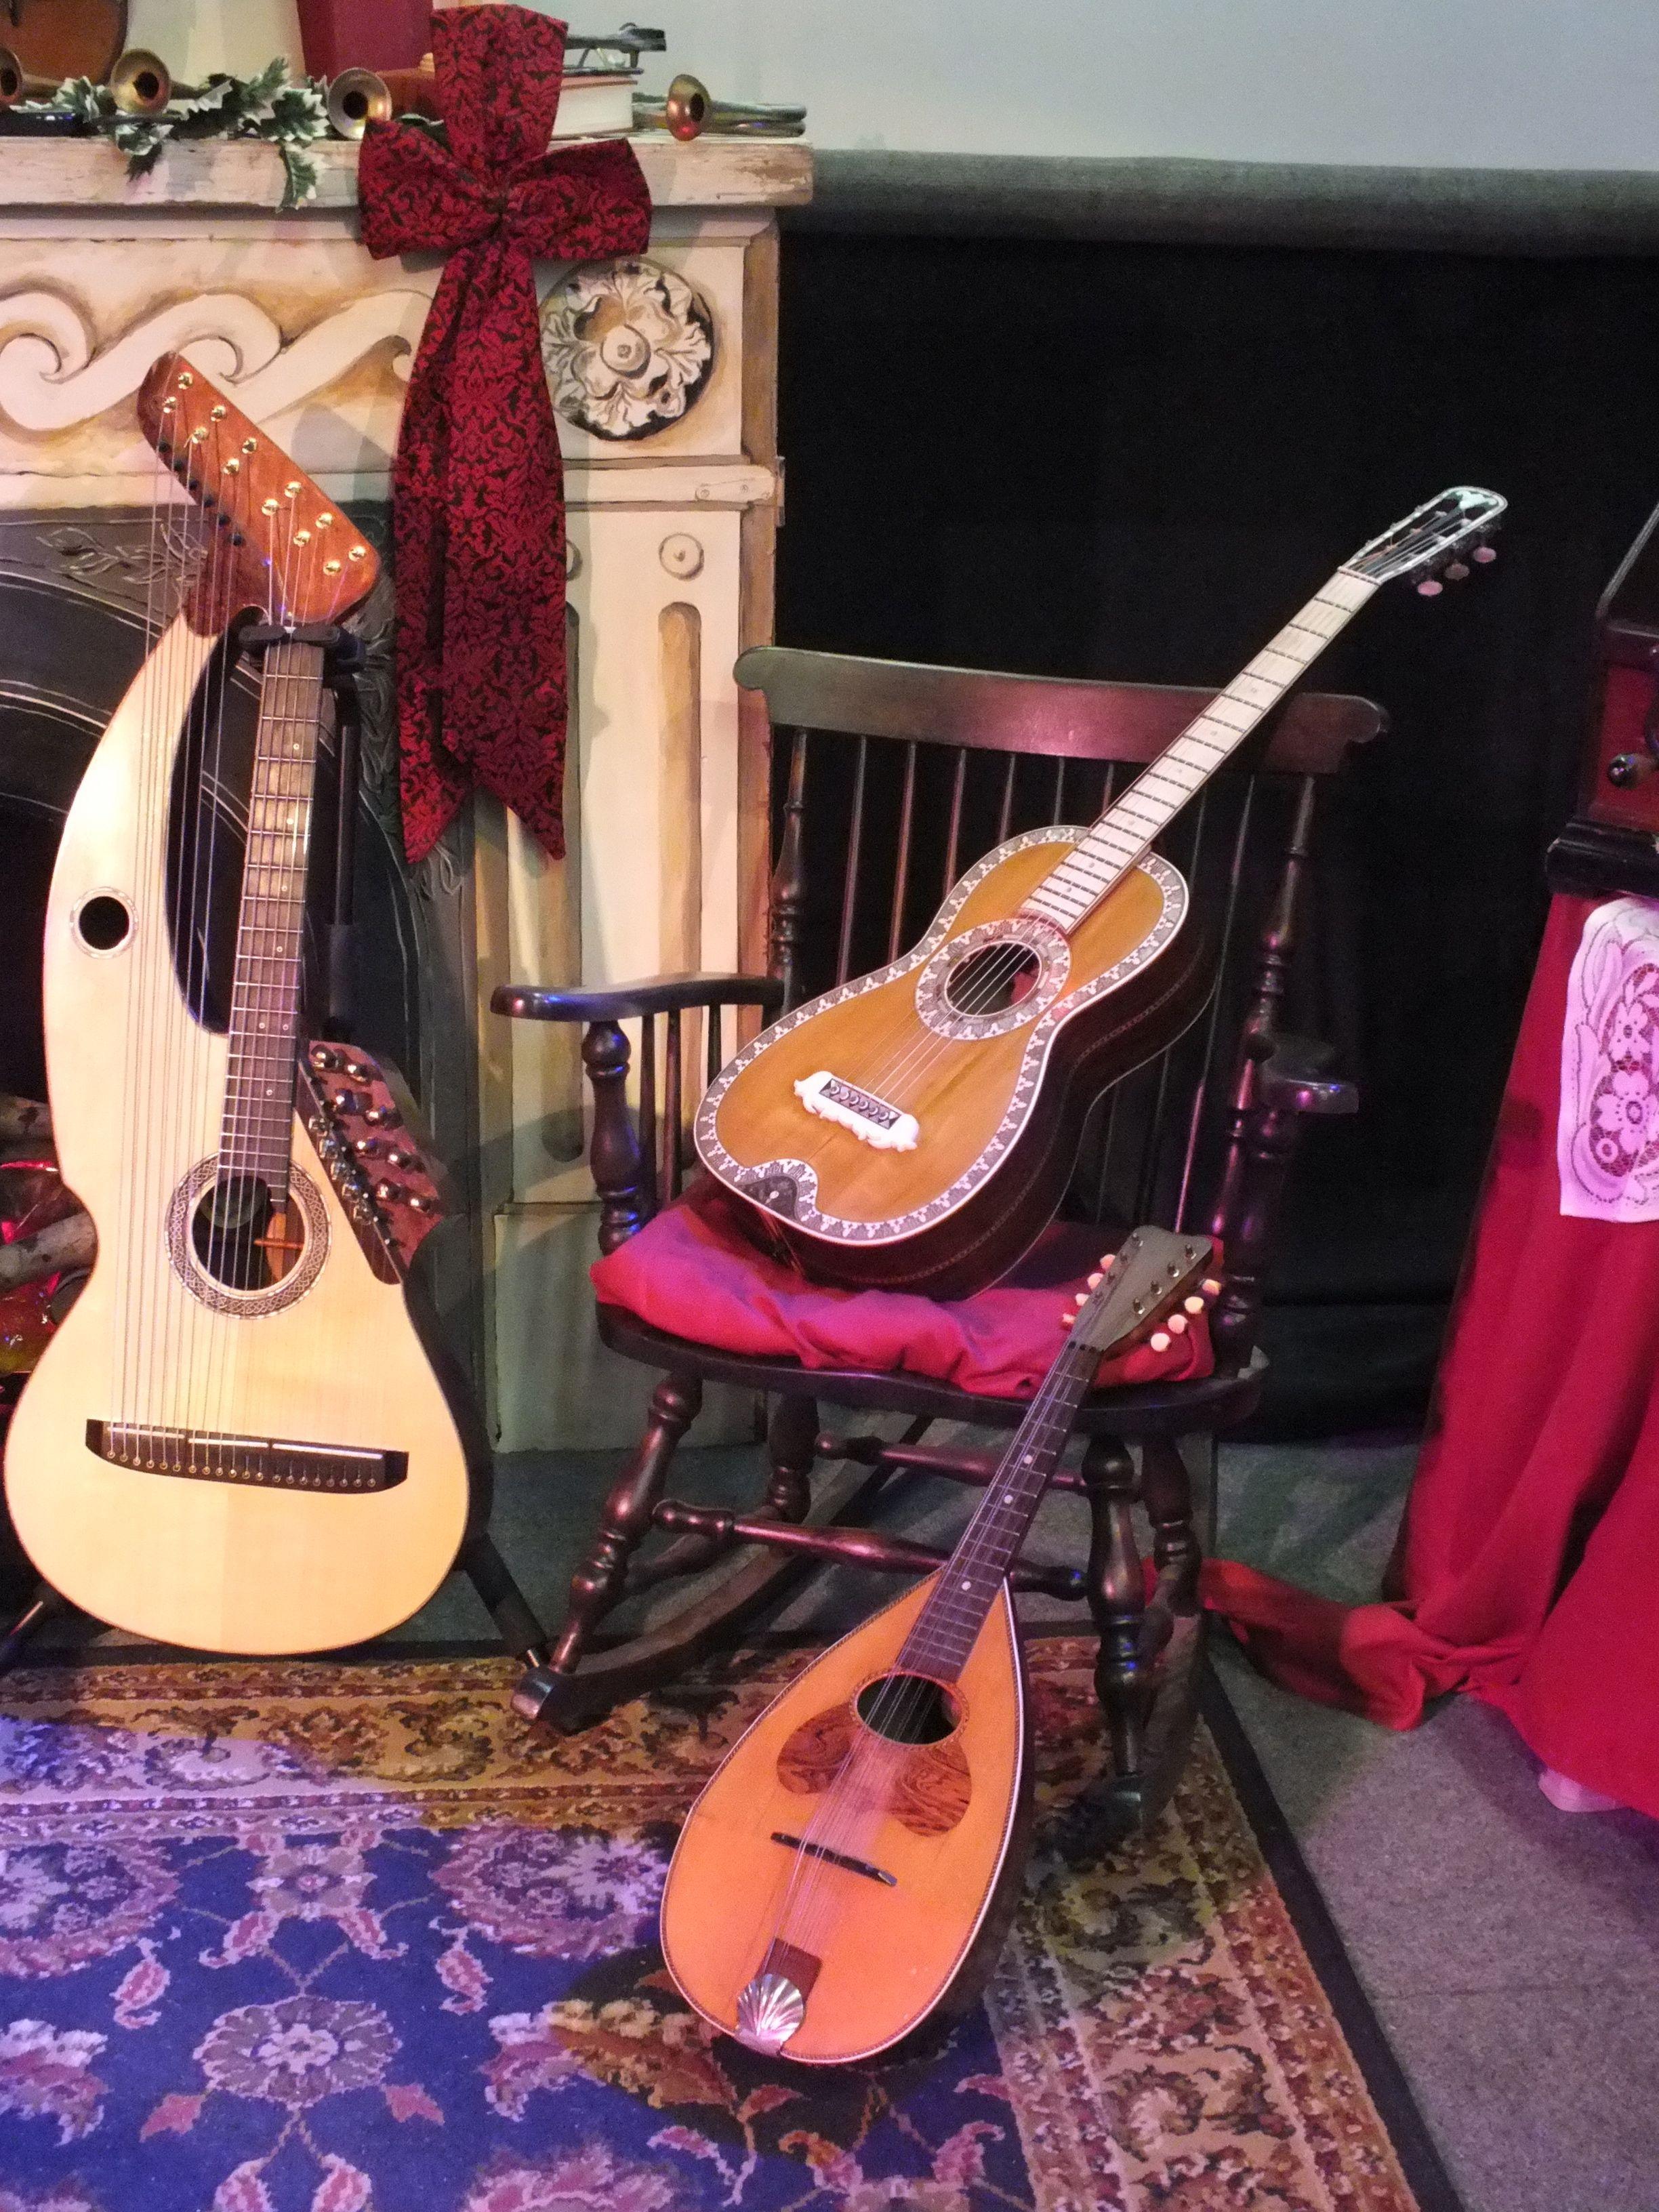 Harp Guitar, Mandoline, and accoustic guitar collection - John Doan.